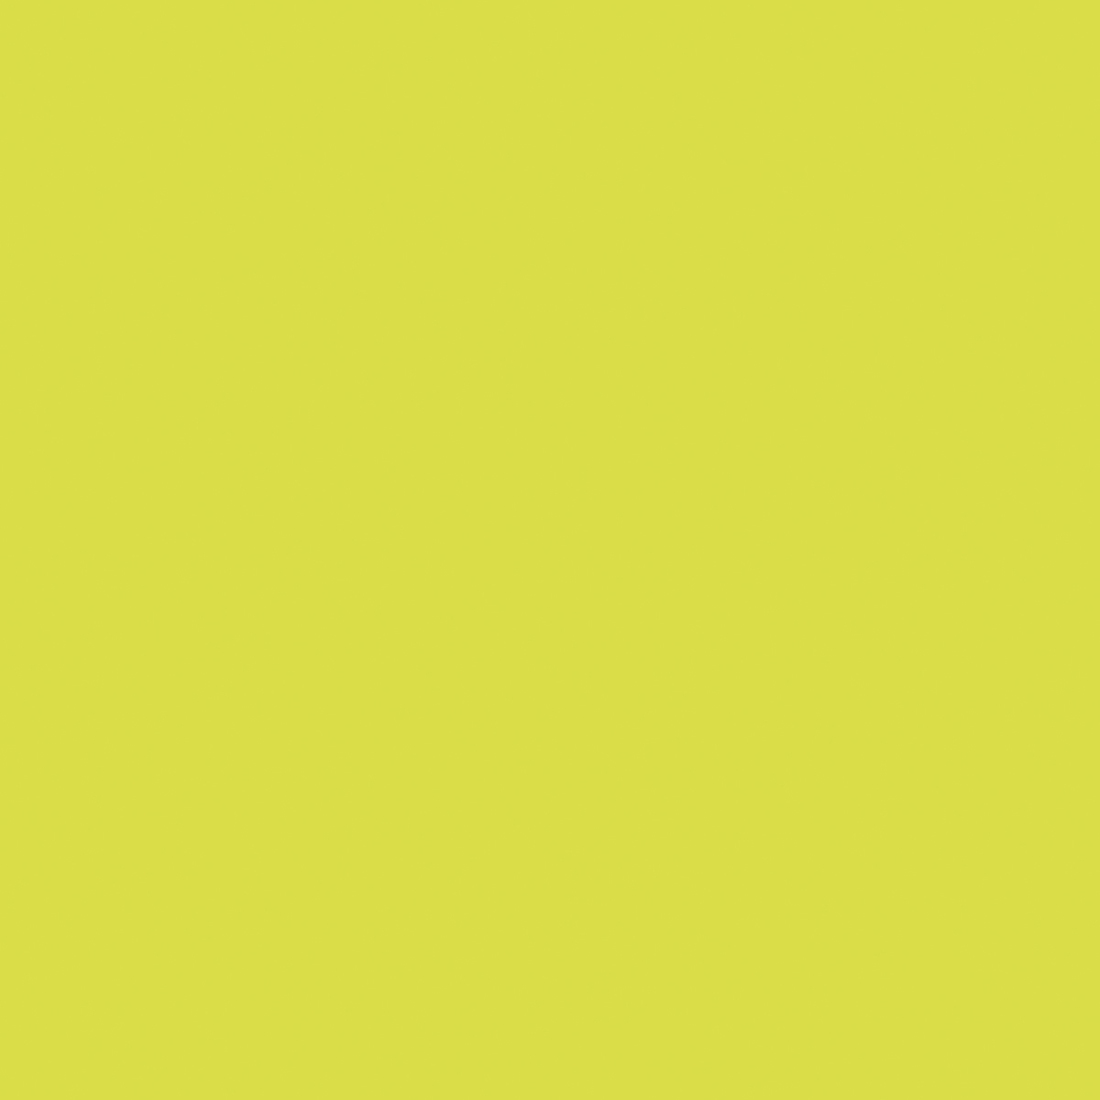 PAL Melaminat Verde lămâie 5519 BS Kronospan